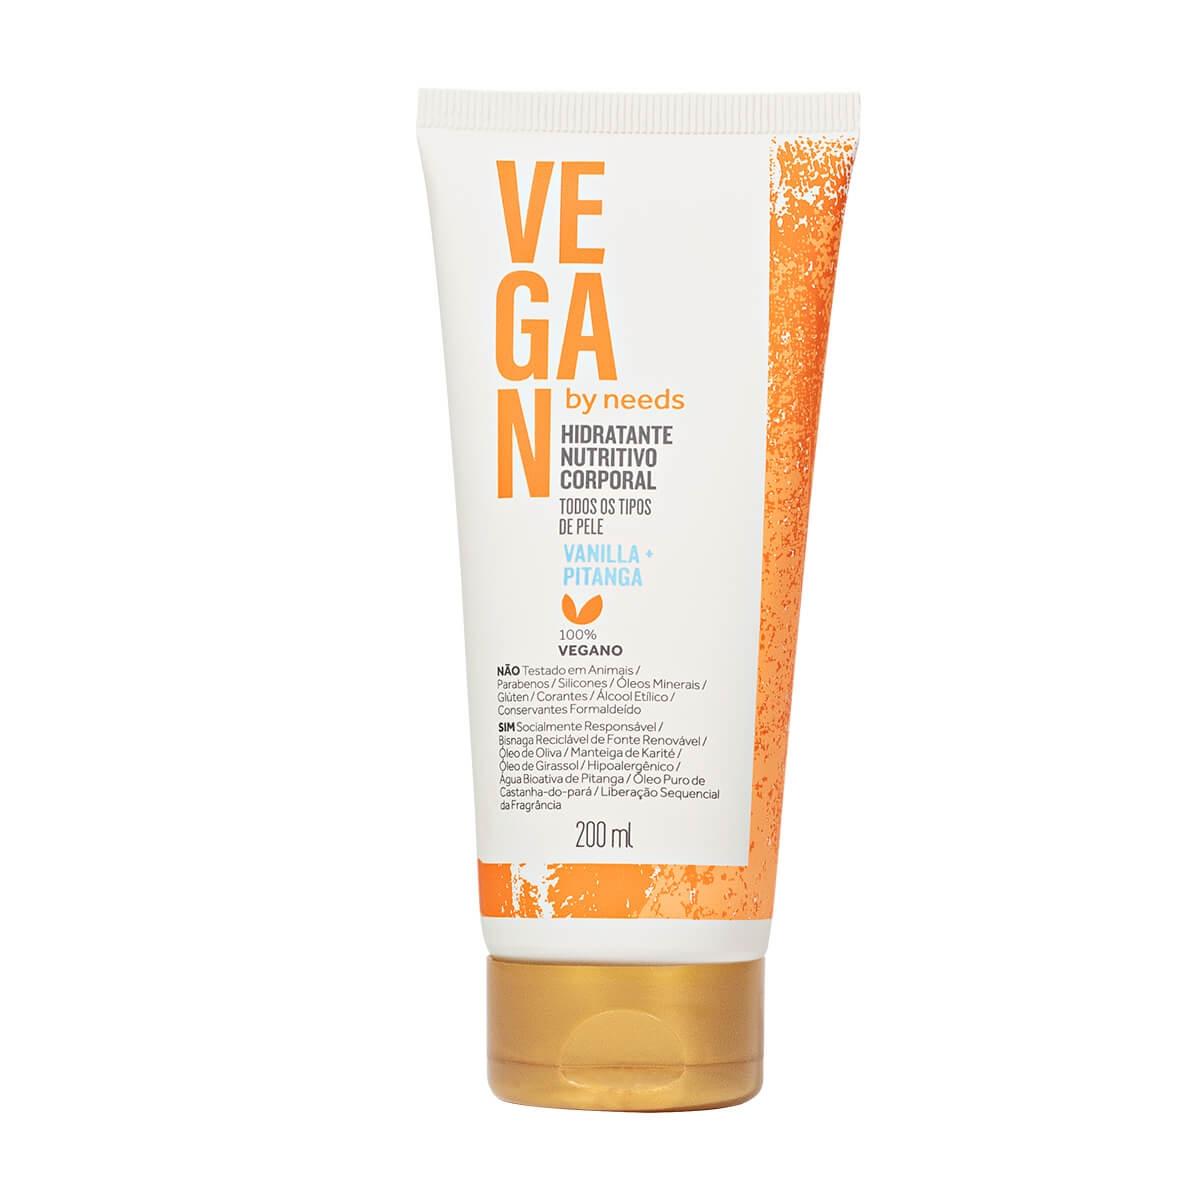 Hidratante Corporal Vegan by Needs Vanilla + Pitanga 200ml